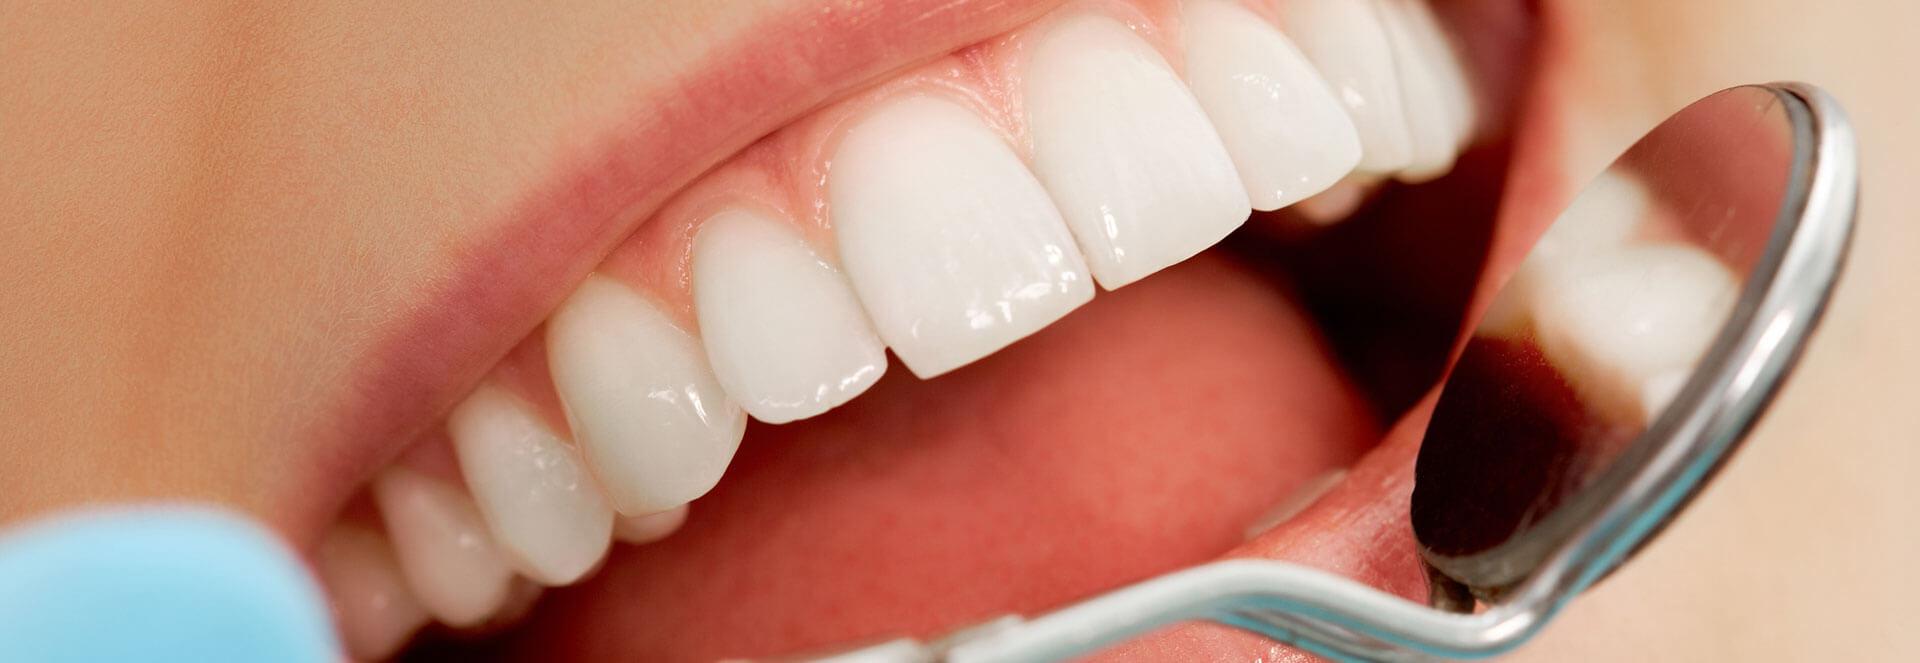 Closeup of examining teeth before using porcelain inlays and onlays